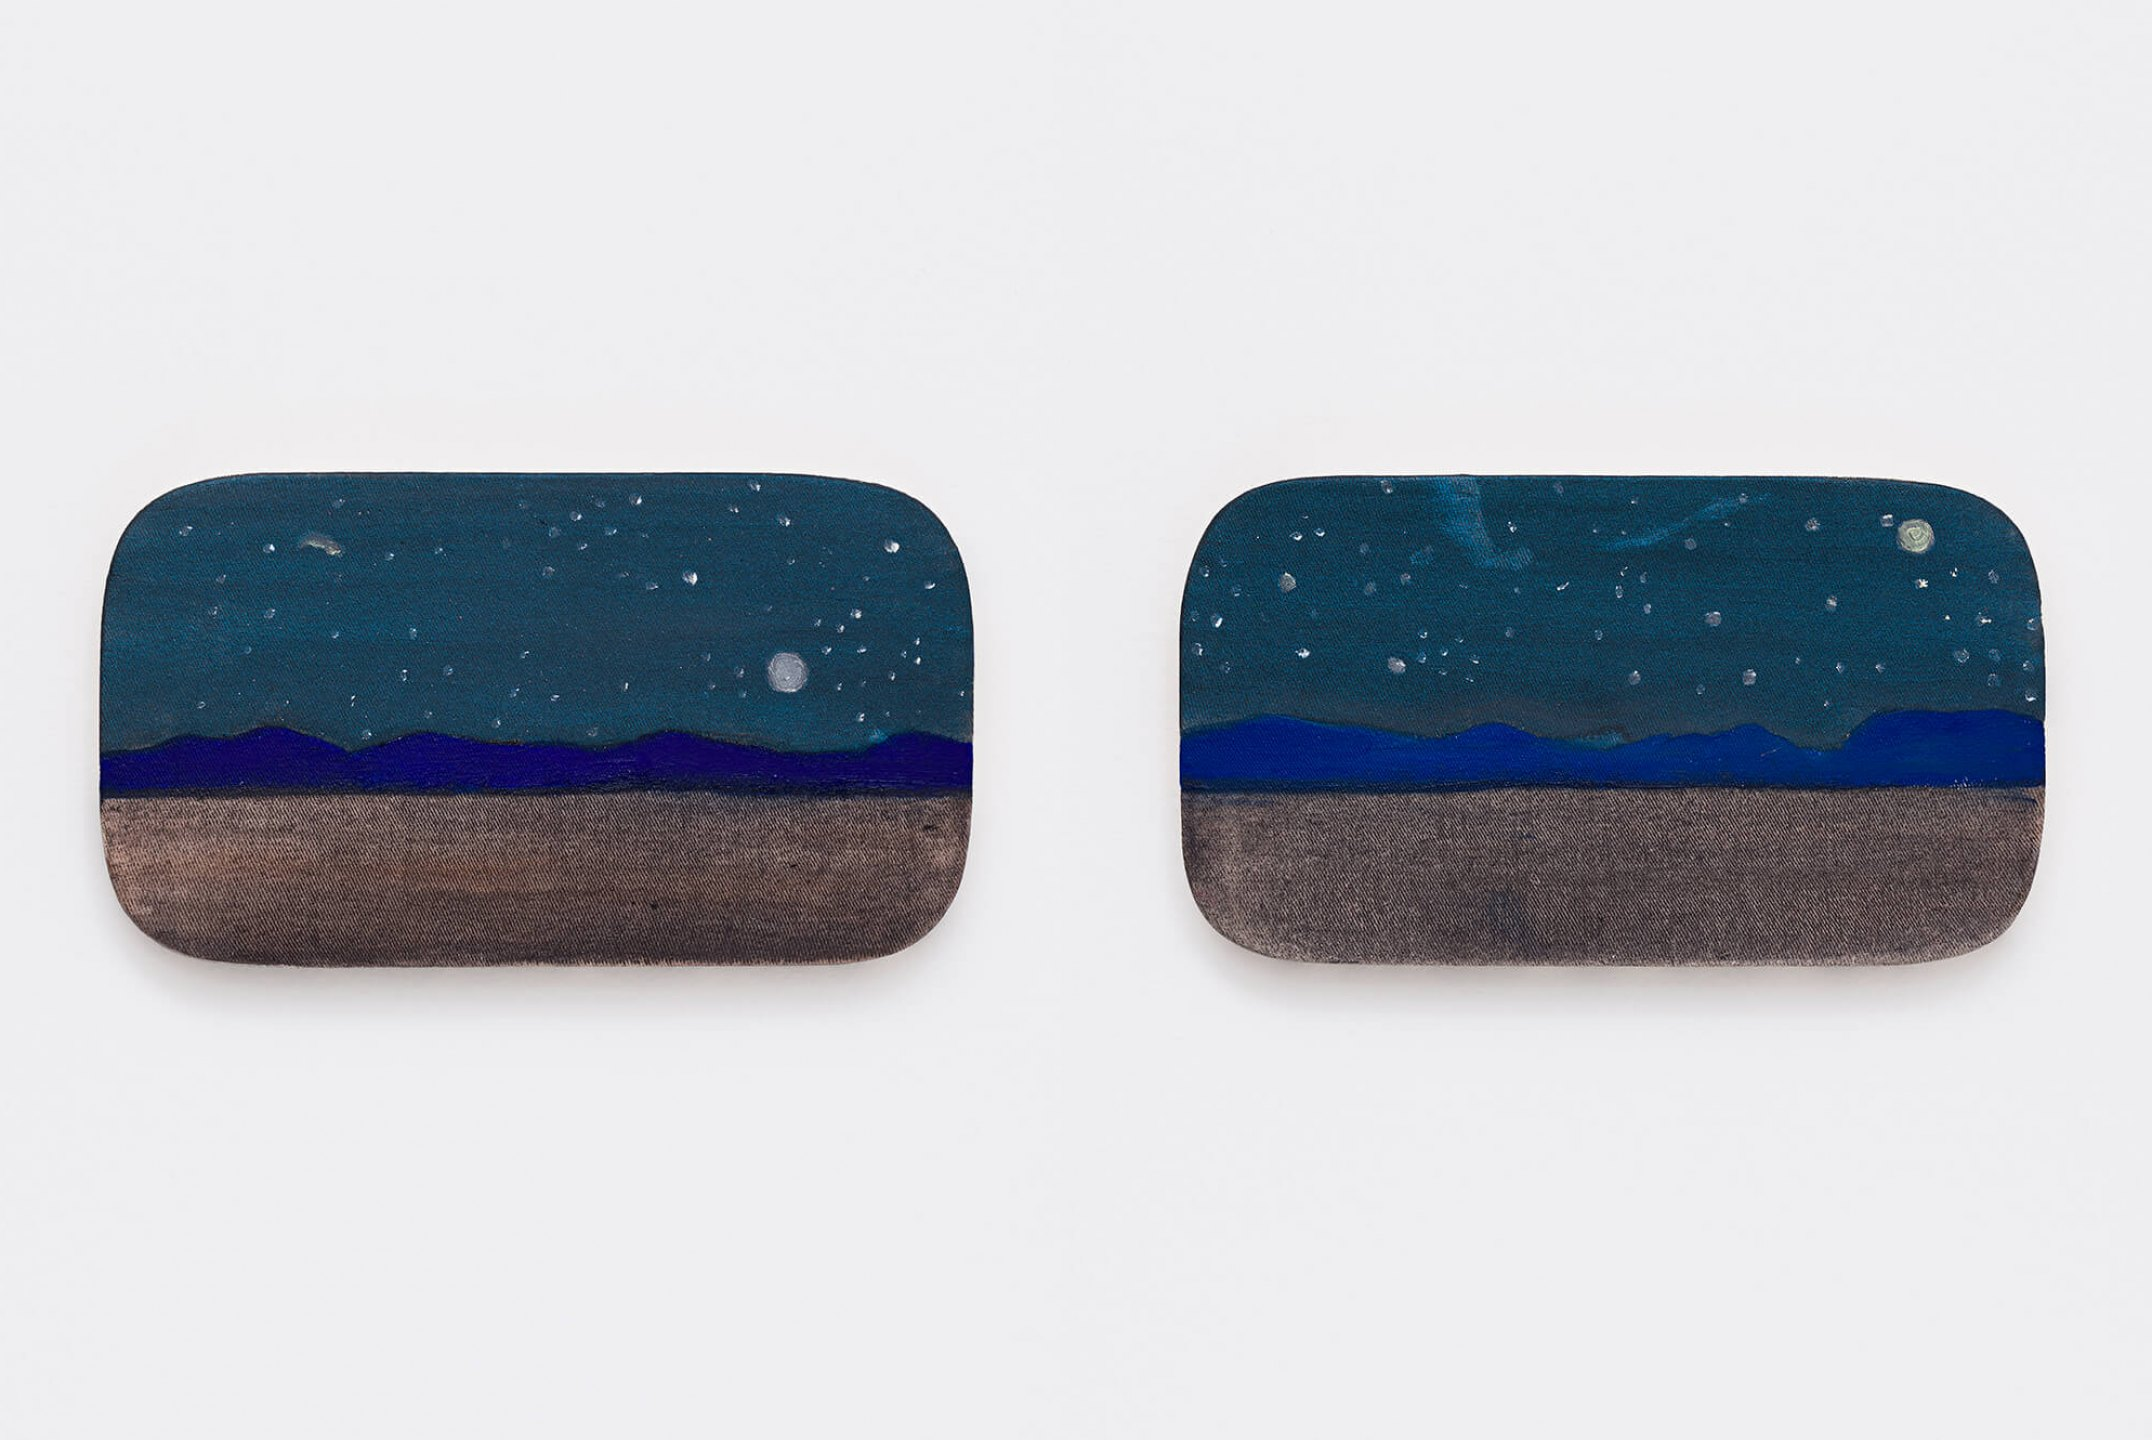 Marina Perez Simão,&nbsp;<em>Untitled,</em>&nbsp;2015, oil and iridescent pigment on canvas, 17 × 30 × 2 cm&nbsp; - Mendes Wood DM